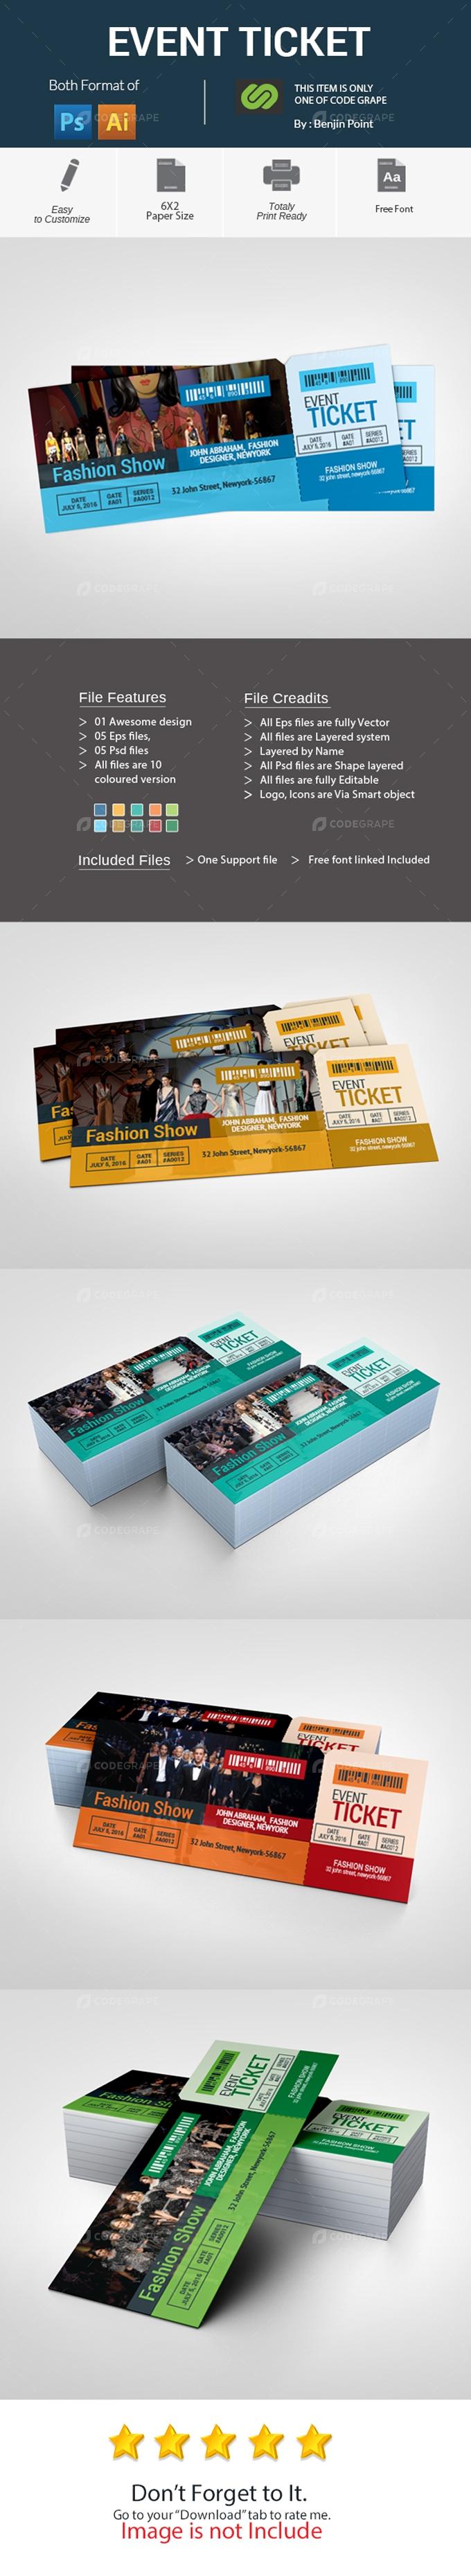 Event Ticket/VIP Pass